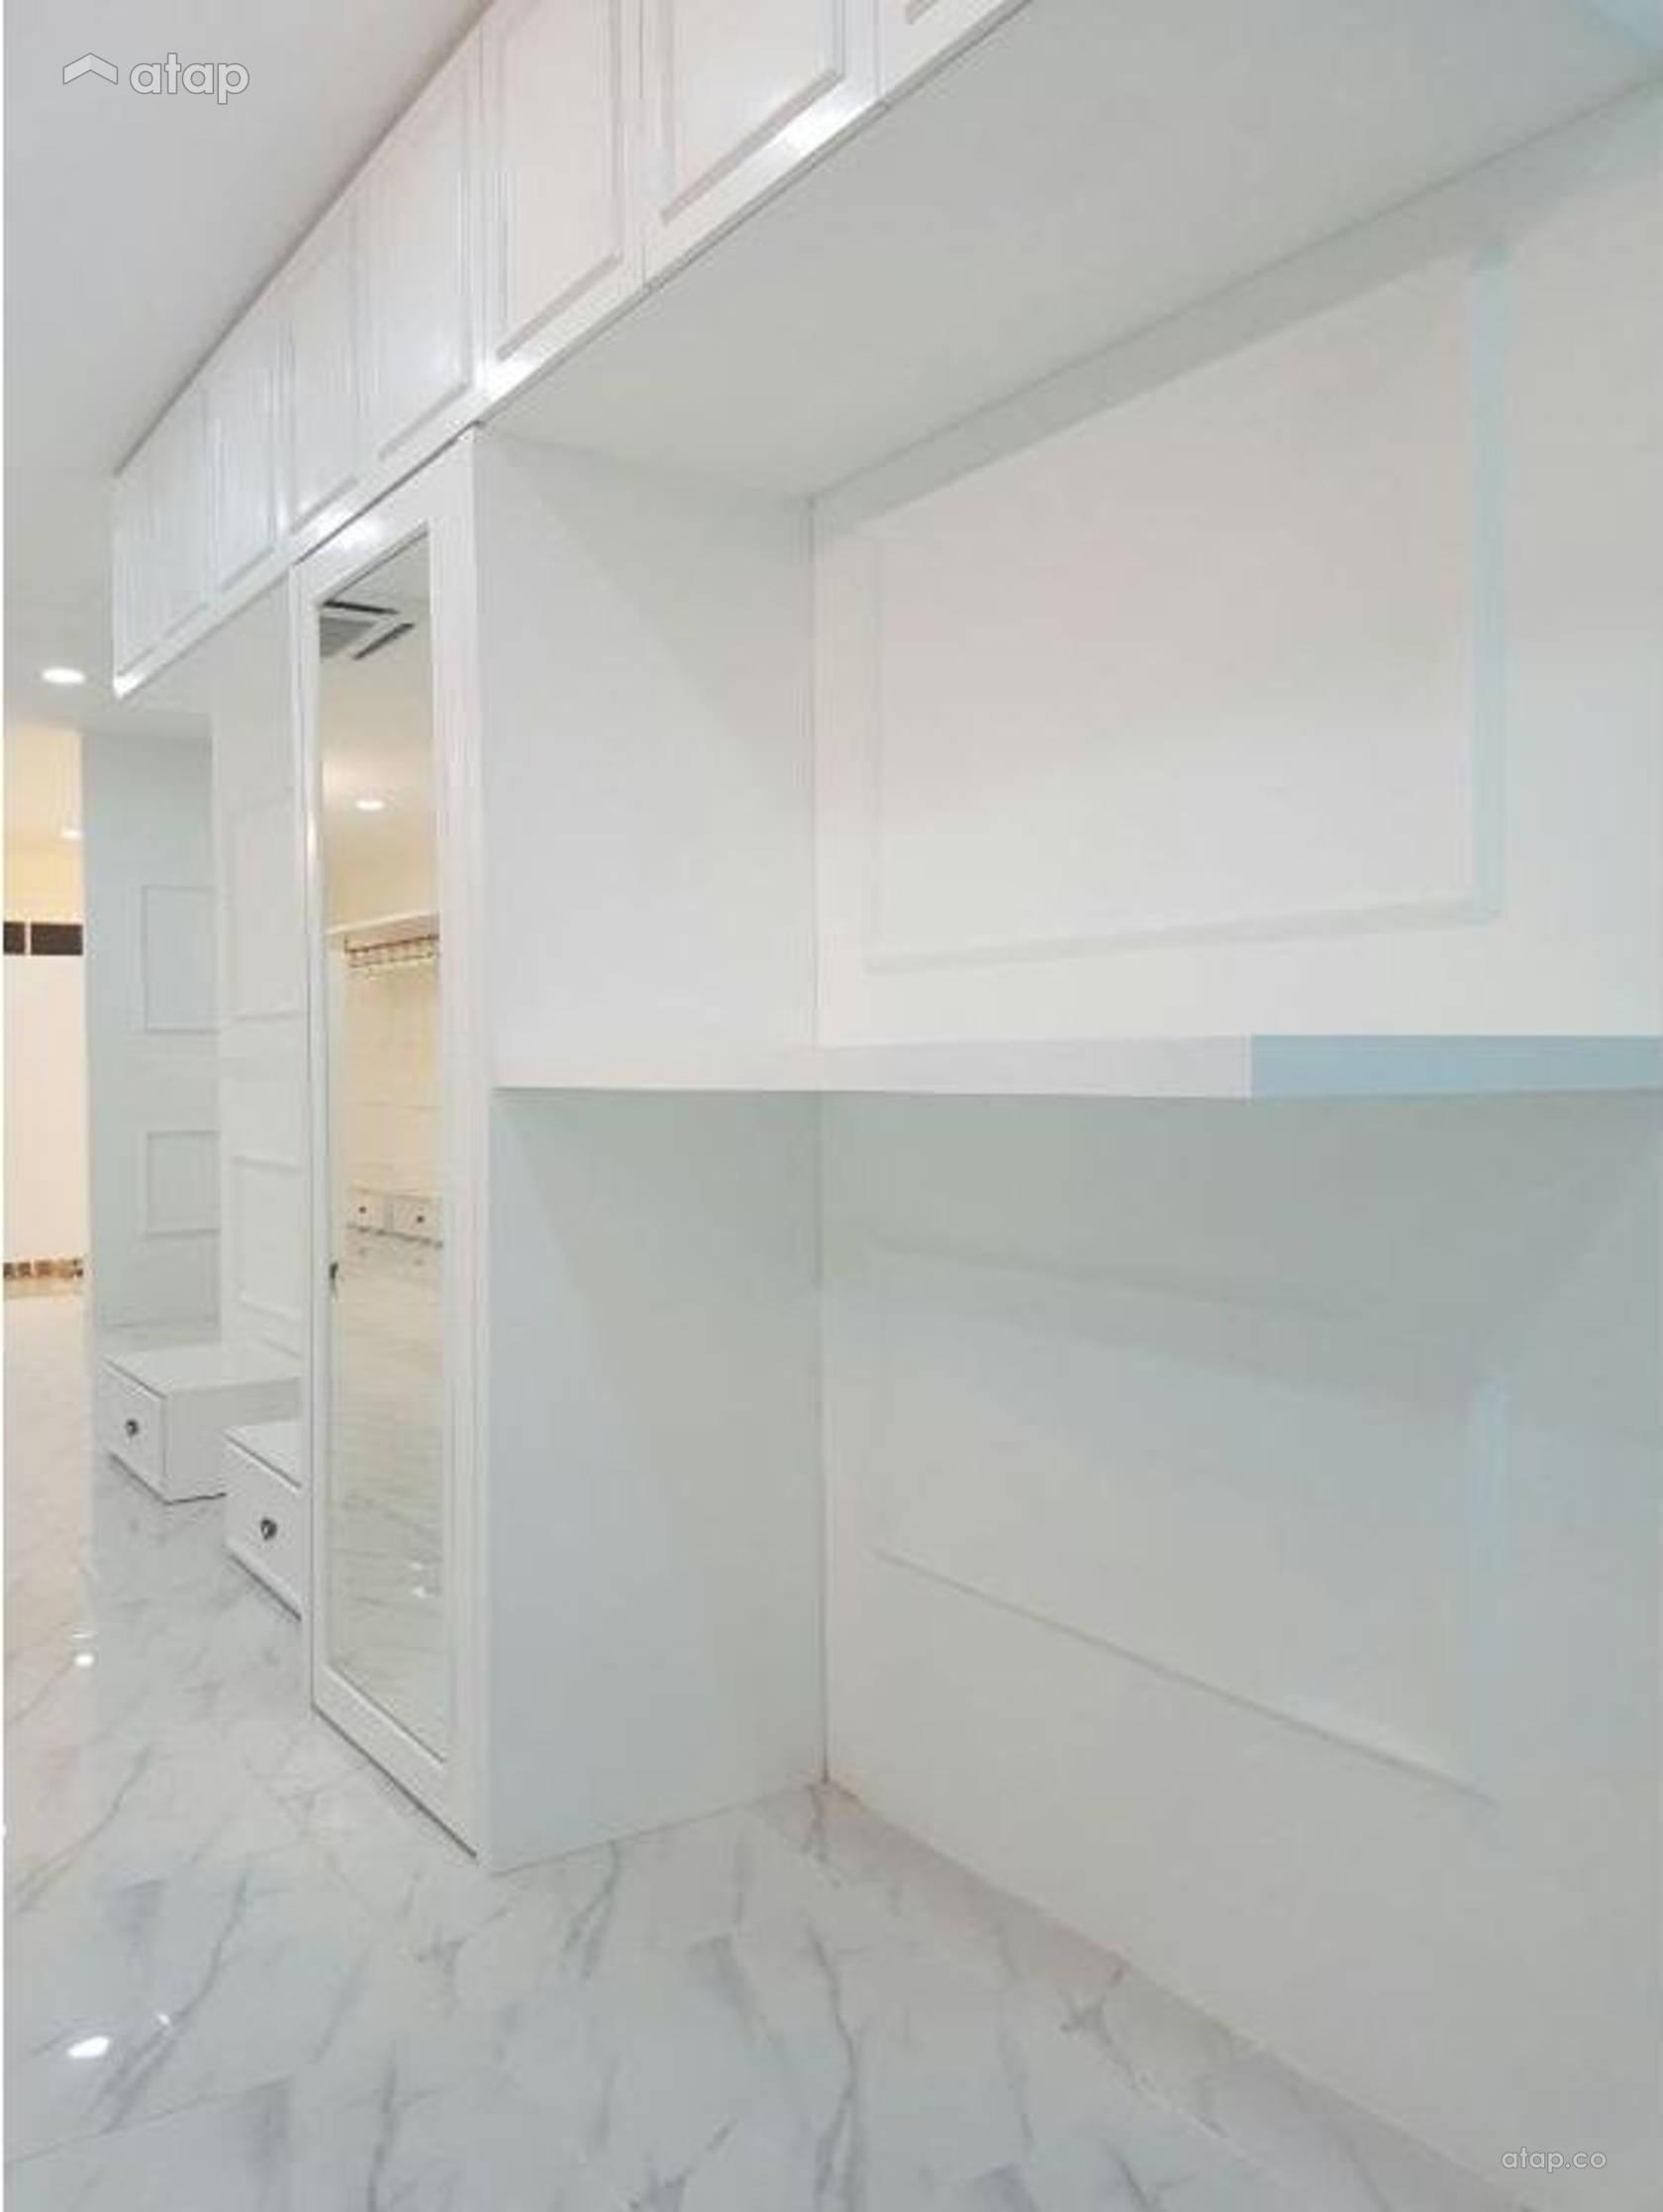 nora danish bangi interior design renovation ideas photos and 1 13